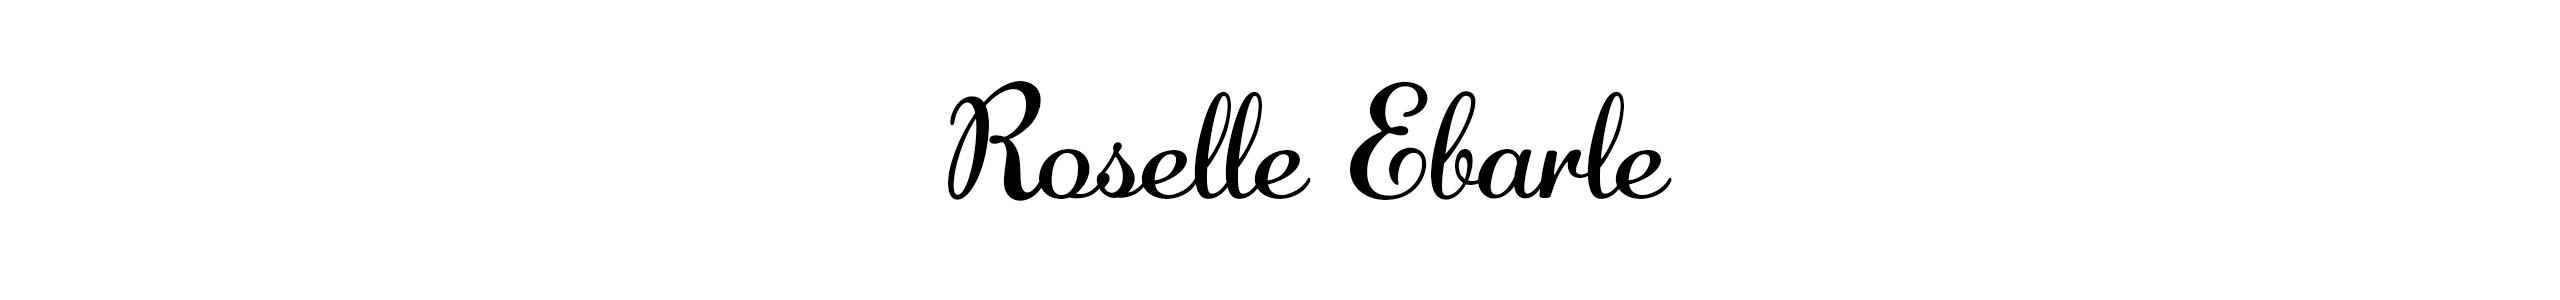 Roselle Ebarle